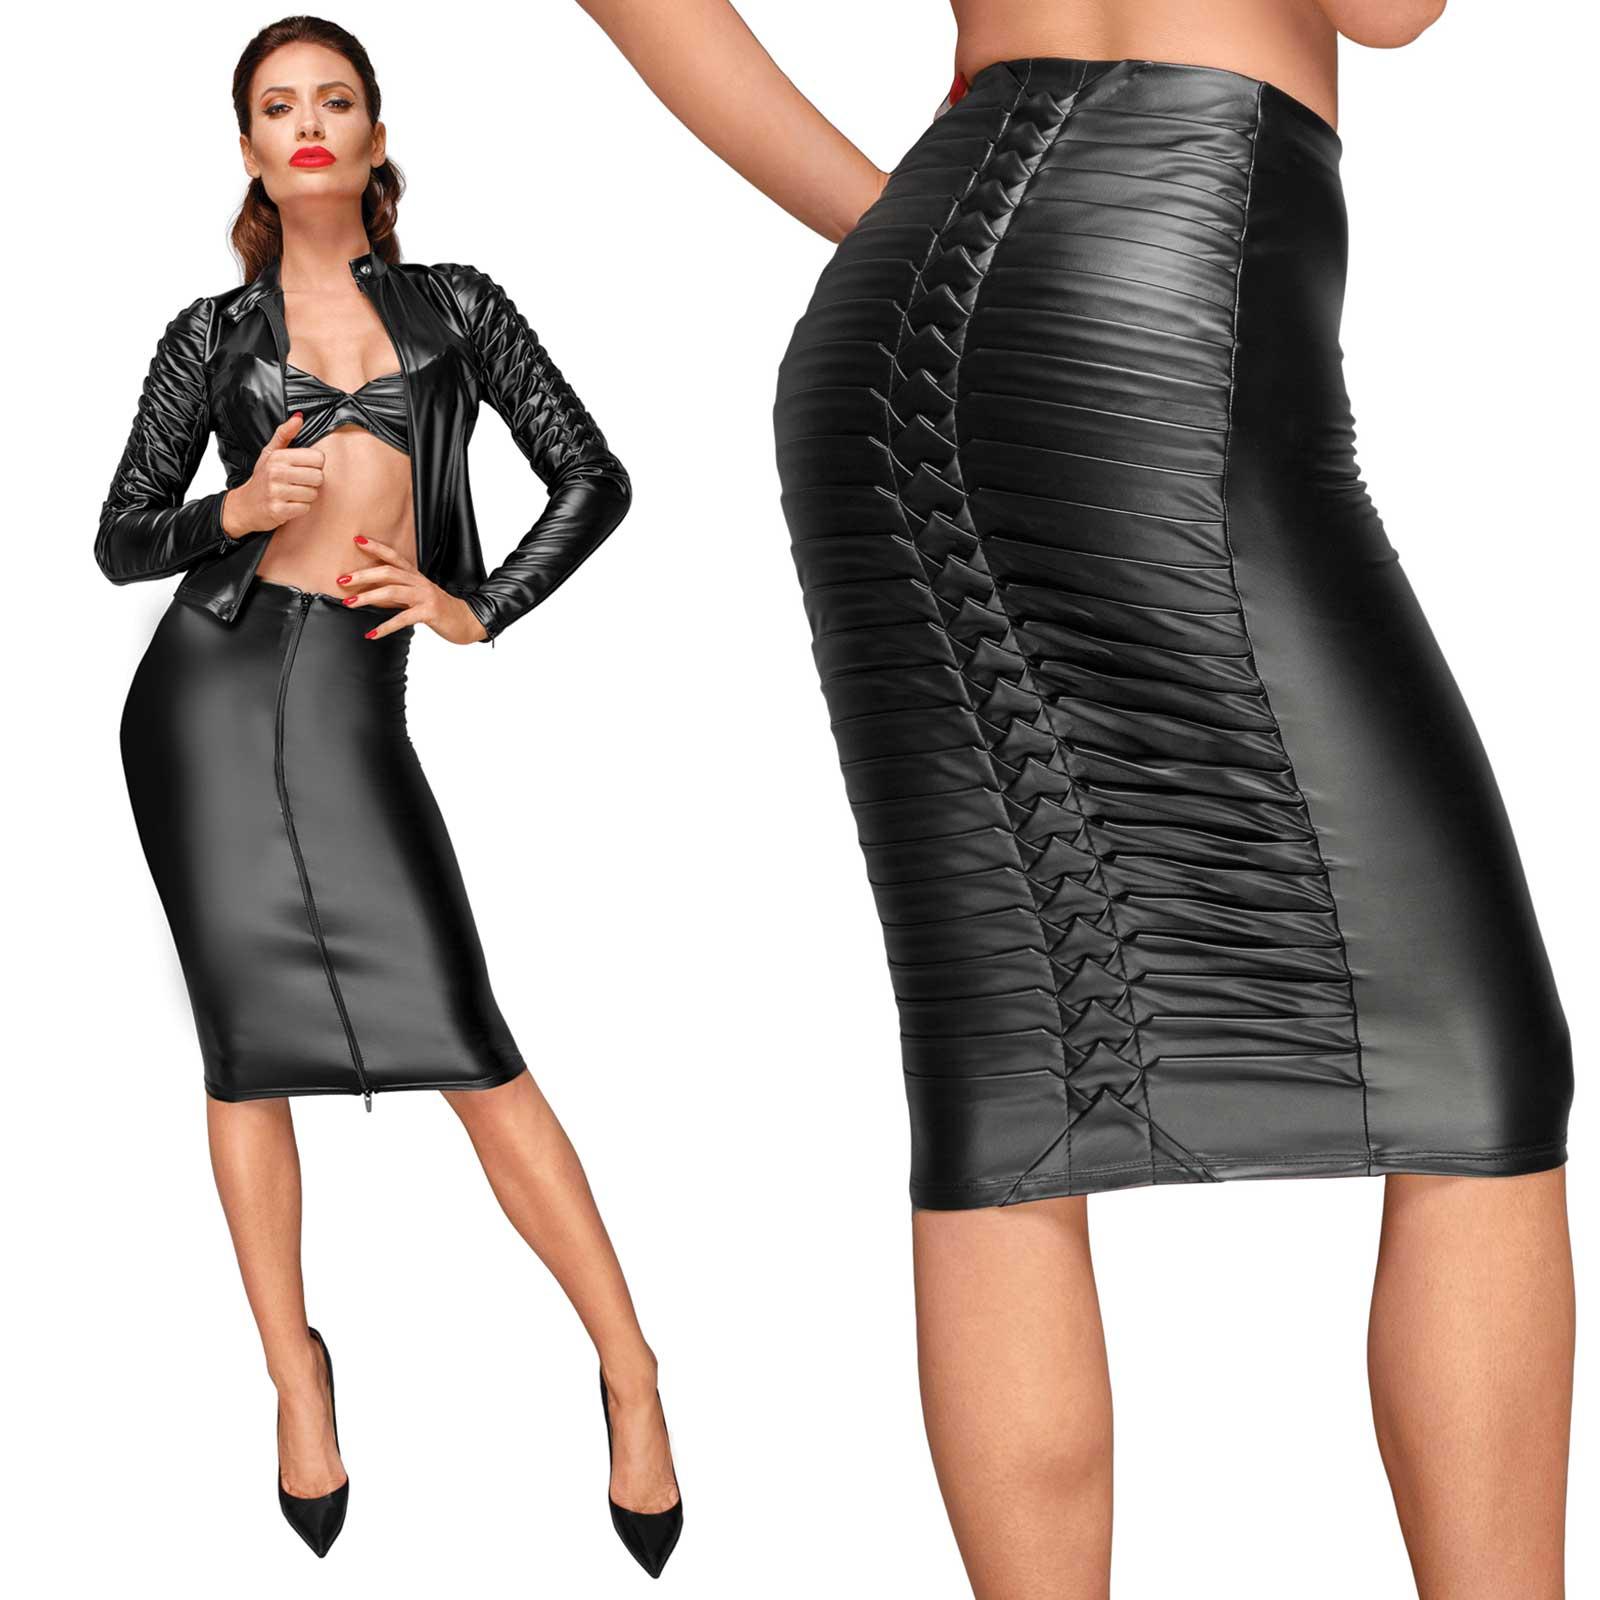 NOIR HANDMADE Wetlook Pleated Pencil Skirt